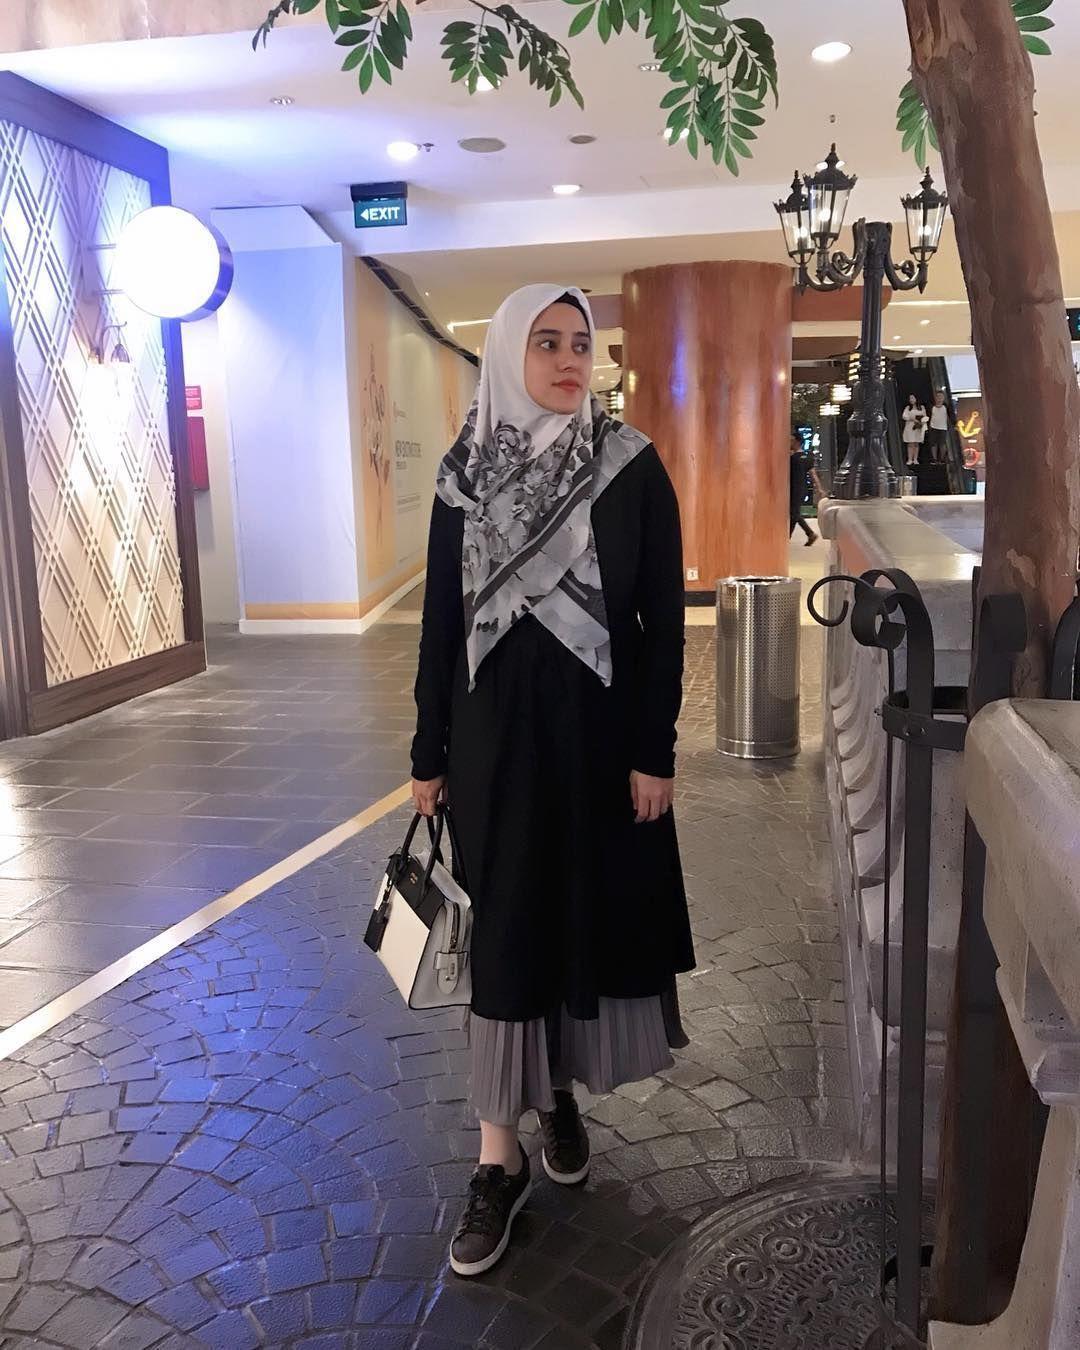 Potret OOTD Hijab Casually Chic a laFairuz A Rafiq